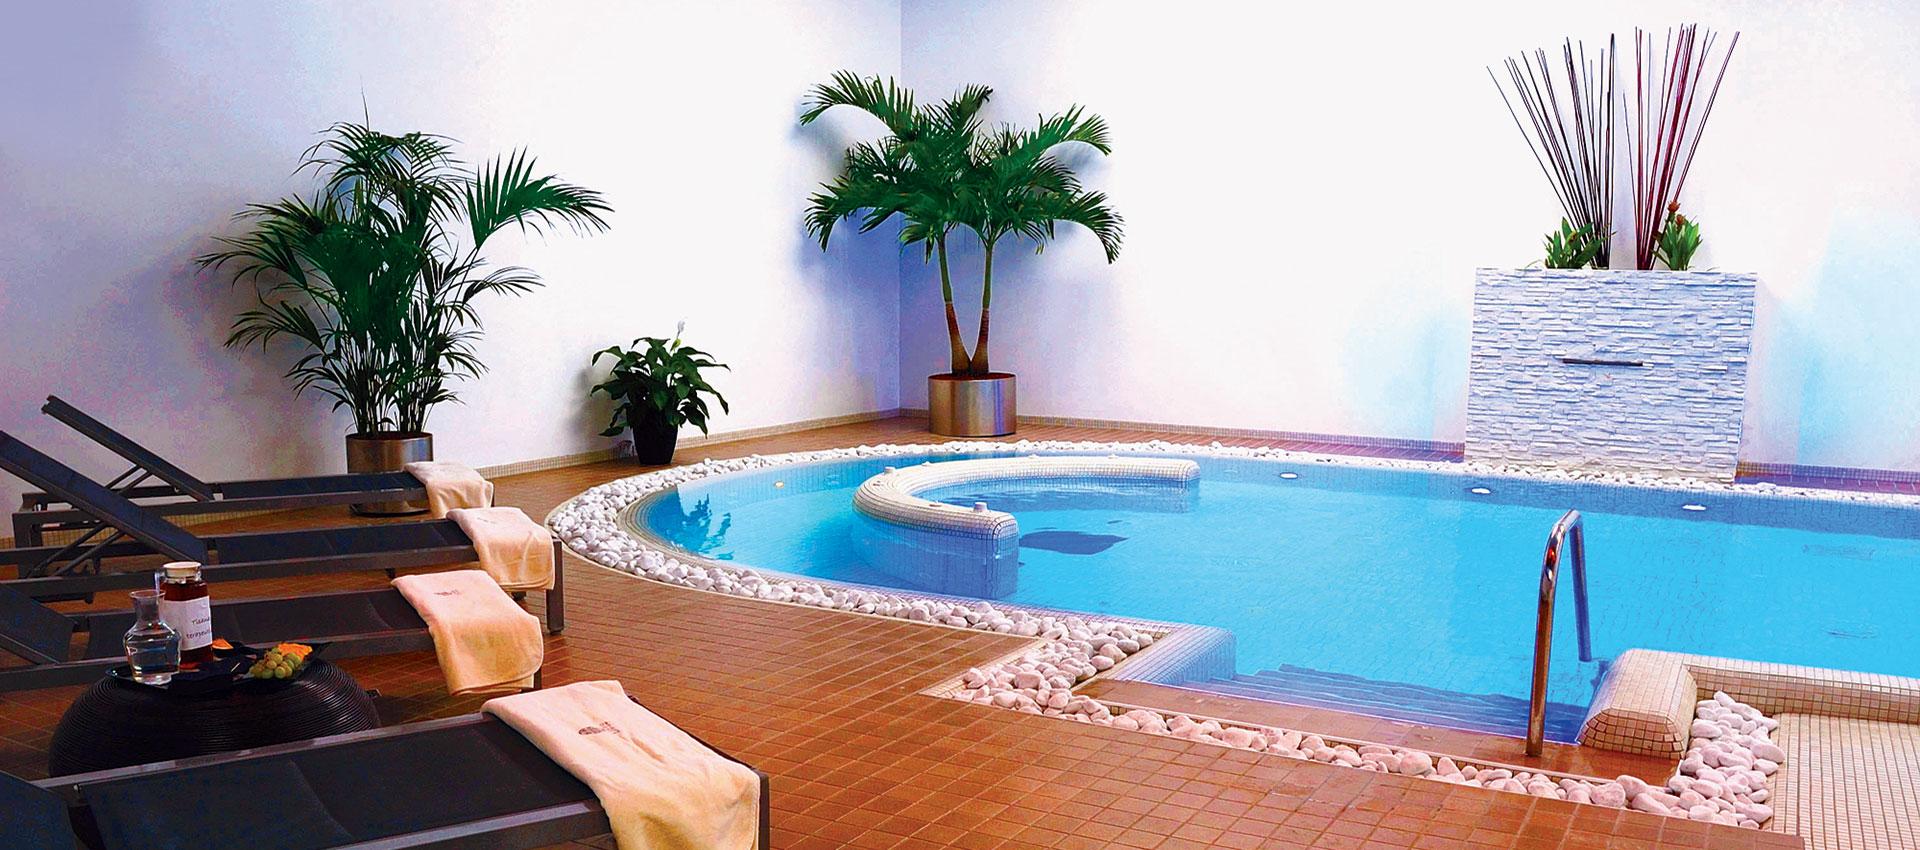 italian-wellness-piscine-cromoterapia